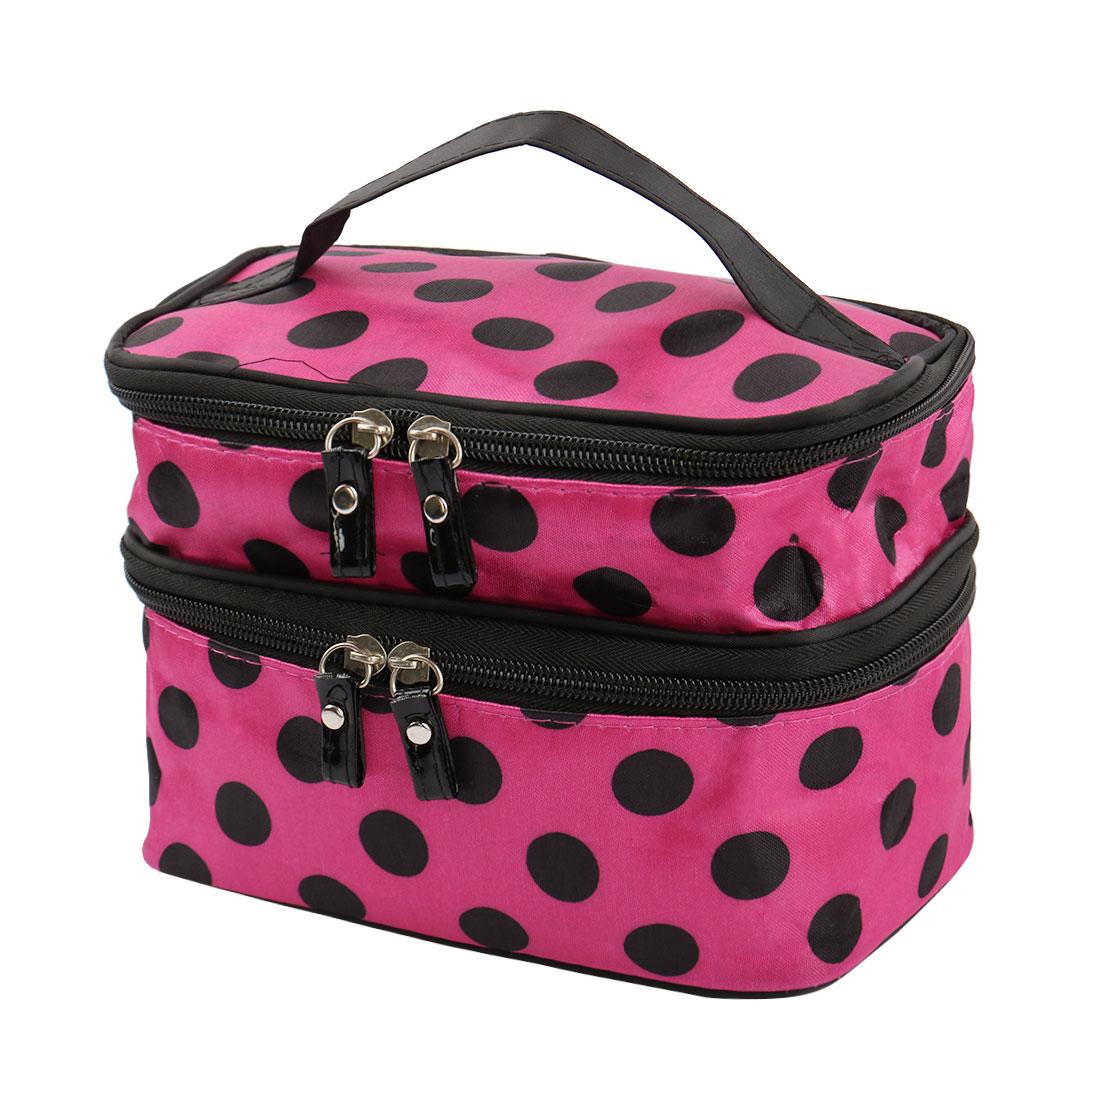 Zipped Cosmetic Bag Double Layer Make Up Case Handbag Pouch (Fuchsia+Black Dots)